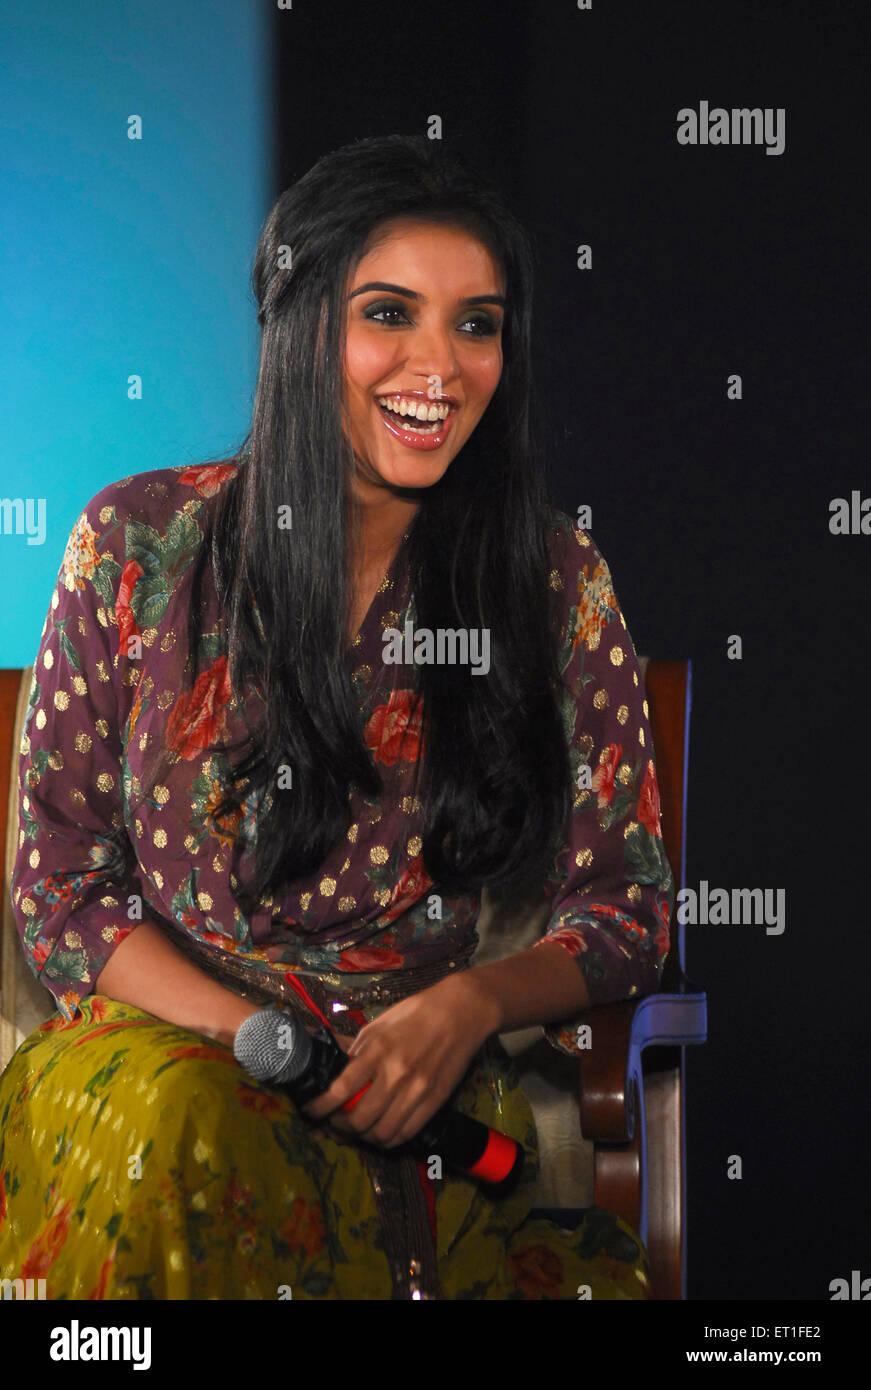 Actress asin ; India NO MR - Stock Image